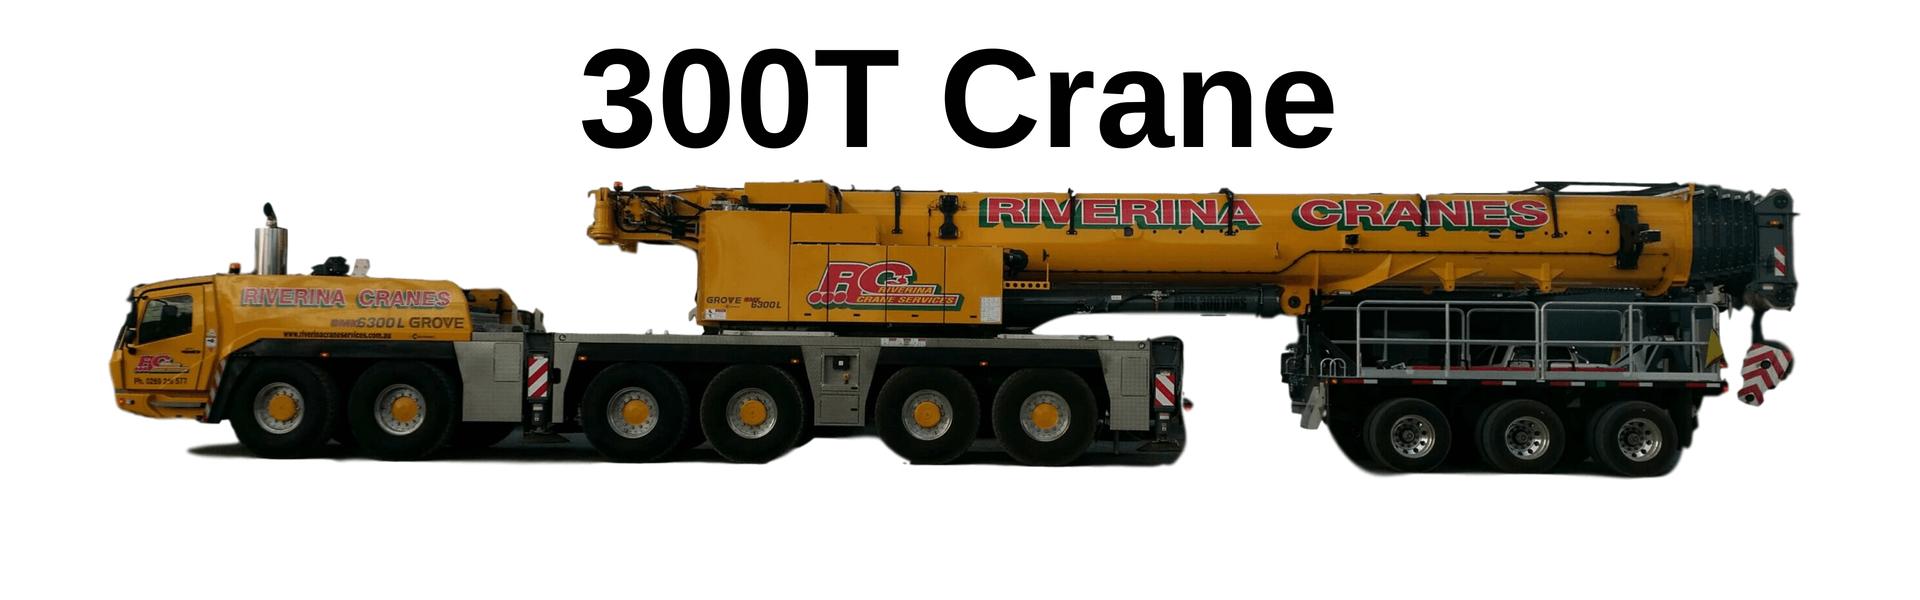 300T Crane